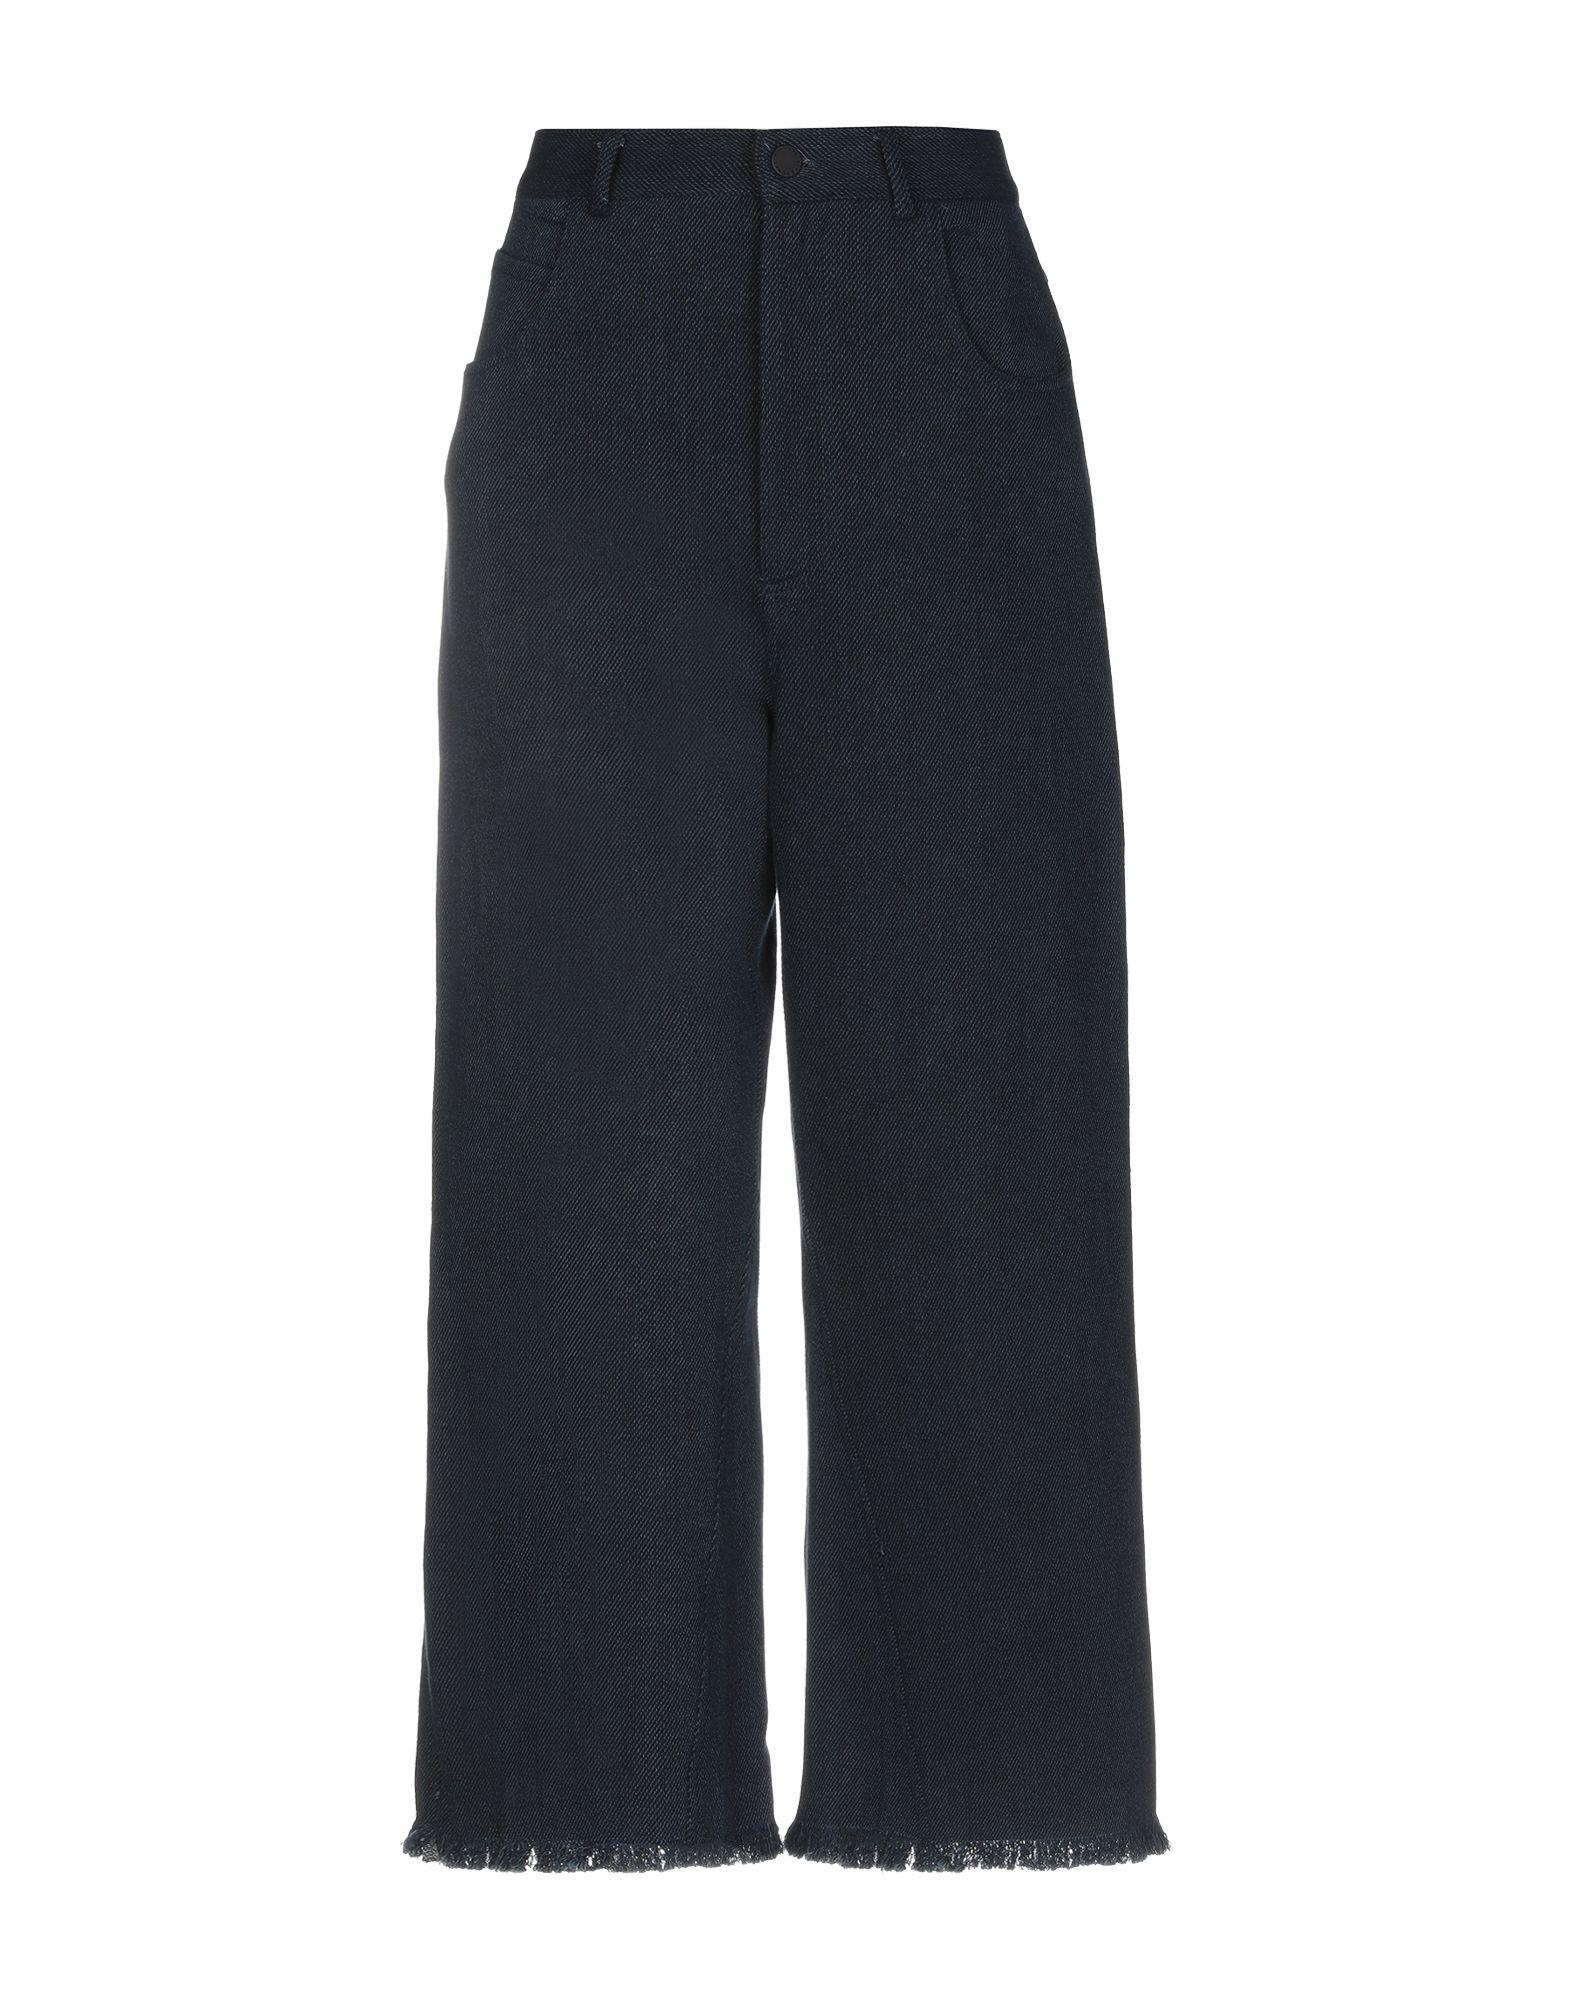 KENDALL + KYLIE Джинсовые брюки босоножки kylie kylie ky002awbldb9